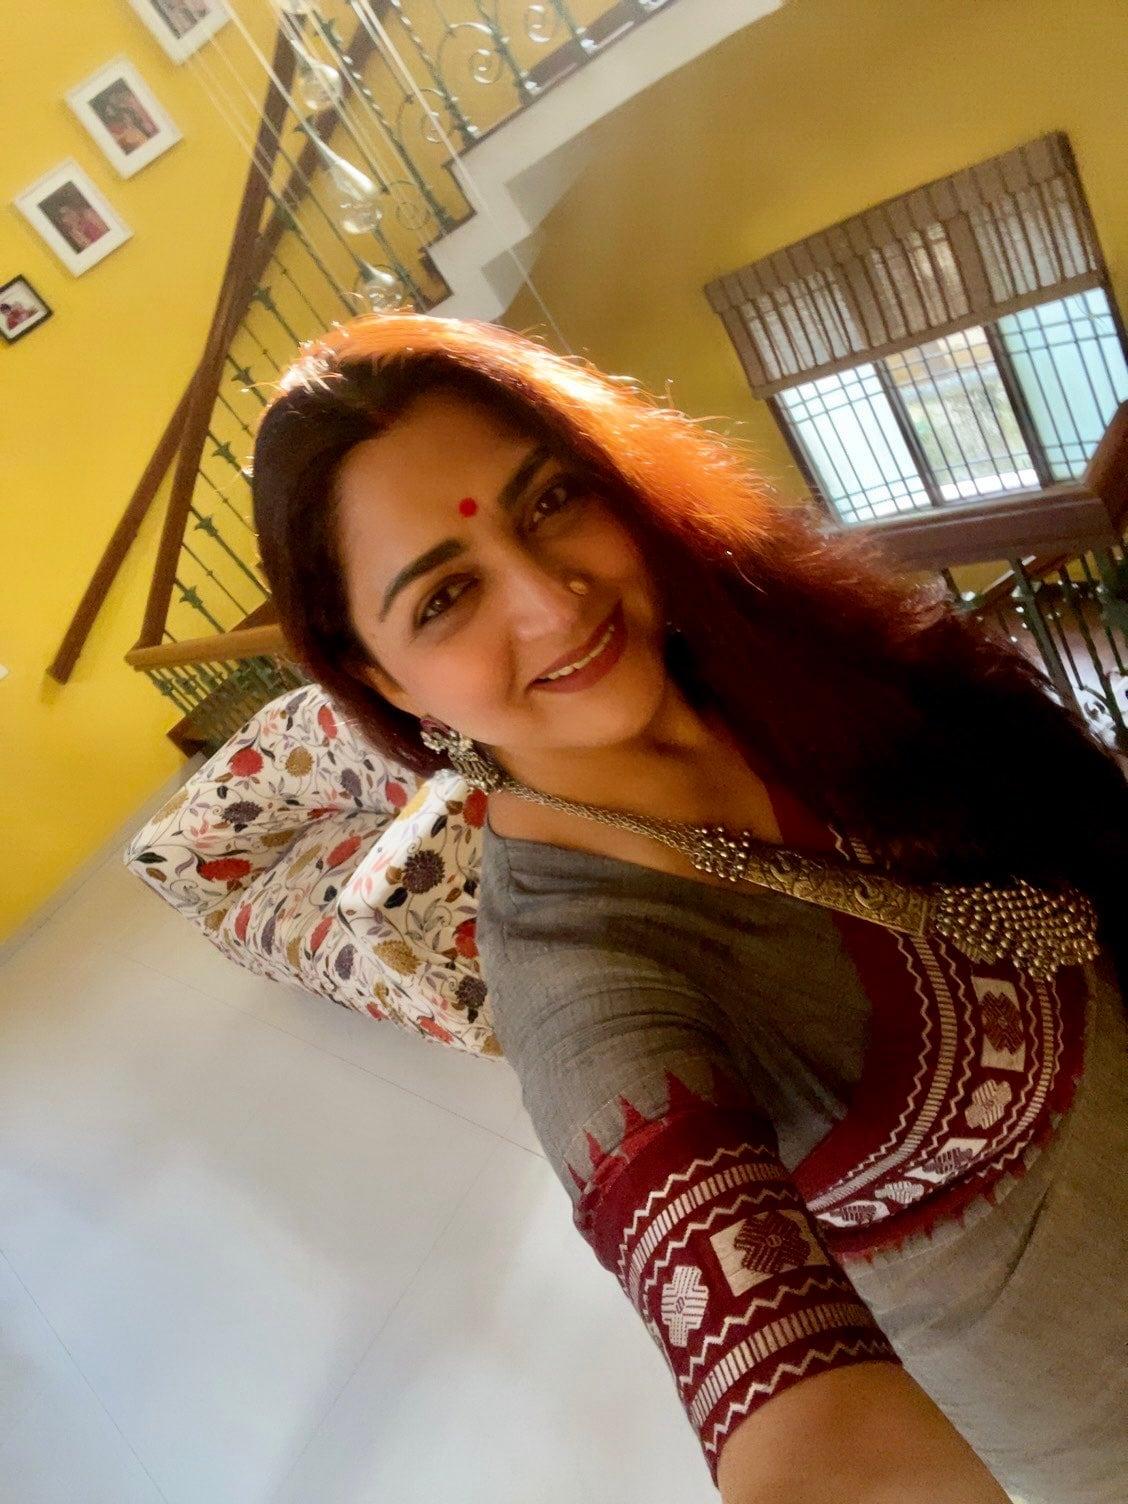 Khushbu Sundar reveals her weight loss secret, Khushbu Sundar, Khushbu Sundar Twitter, khushbu sundar, khushbu sundar twitter id, khushbu sundar serial, khushbu sundar bjp, khushbu sundar new serial, khushbu sundar upcoming serial, khushbu sundar zee tamil, khushbu sundar zee tamil serial, khushbu sundar gokulathil seethai, khushbu sundar gokulathil seethai serial, Khushbu Sundar weight loss, Khushbu Sundar weightloss tips, குஷ்பு சுந்தர், குஷ்பு சுந்தர் ட்விட்டர், குஷ்பூ சுந்தர் சீரியல், குஷ்பு பாஜக, குஷ்பு சீரியல், குஷ்பு புதிய சீரியல், குஷ்பு ஜீ தமிழ் சீரியல், குஷ்பு சன் டிவி, குஷ்பு சுந்தர் எடைகுறைப்பு